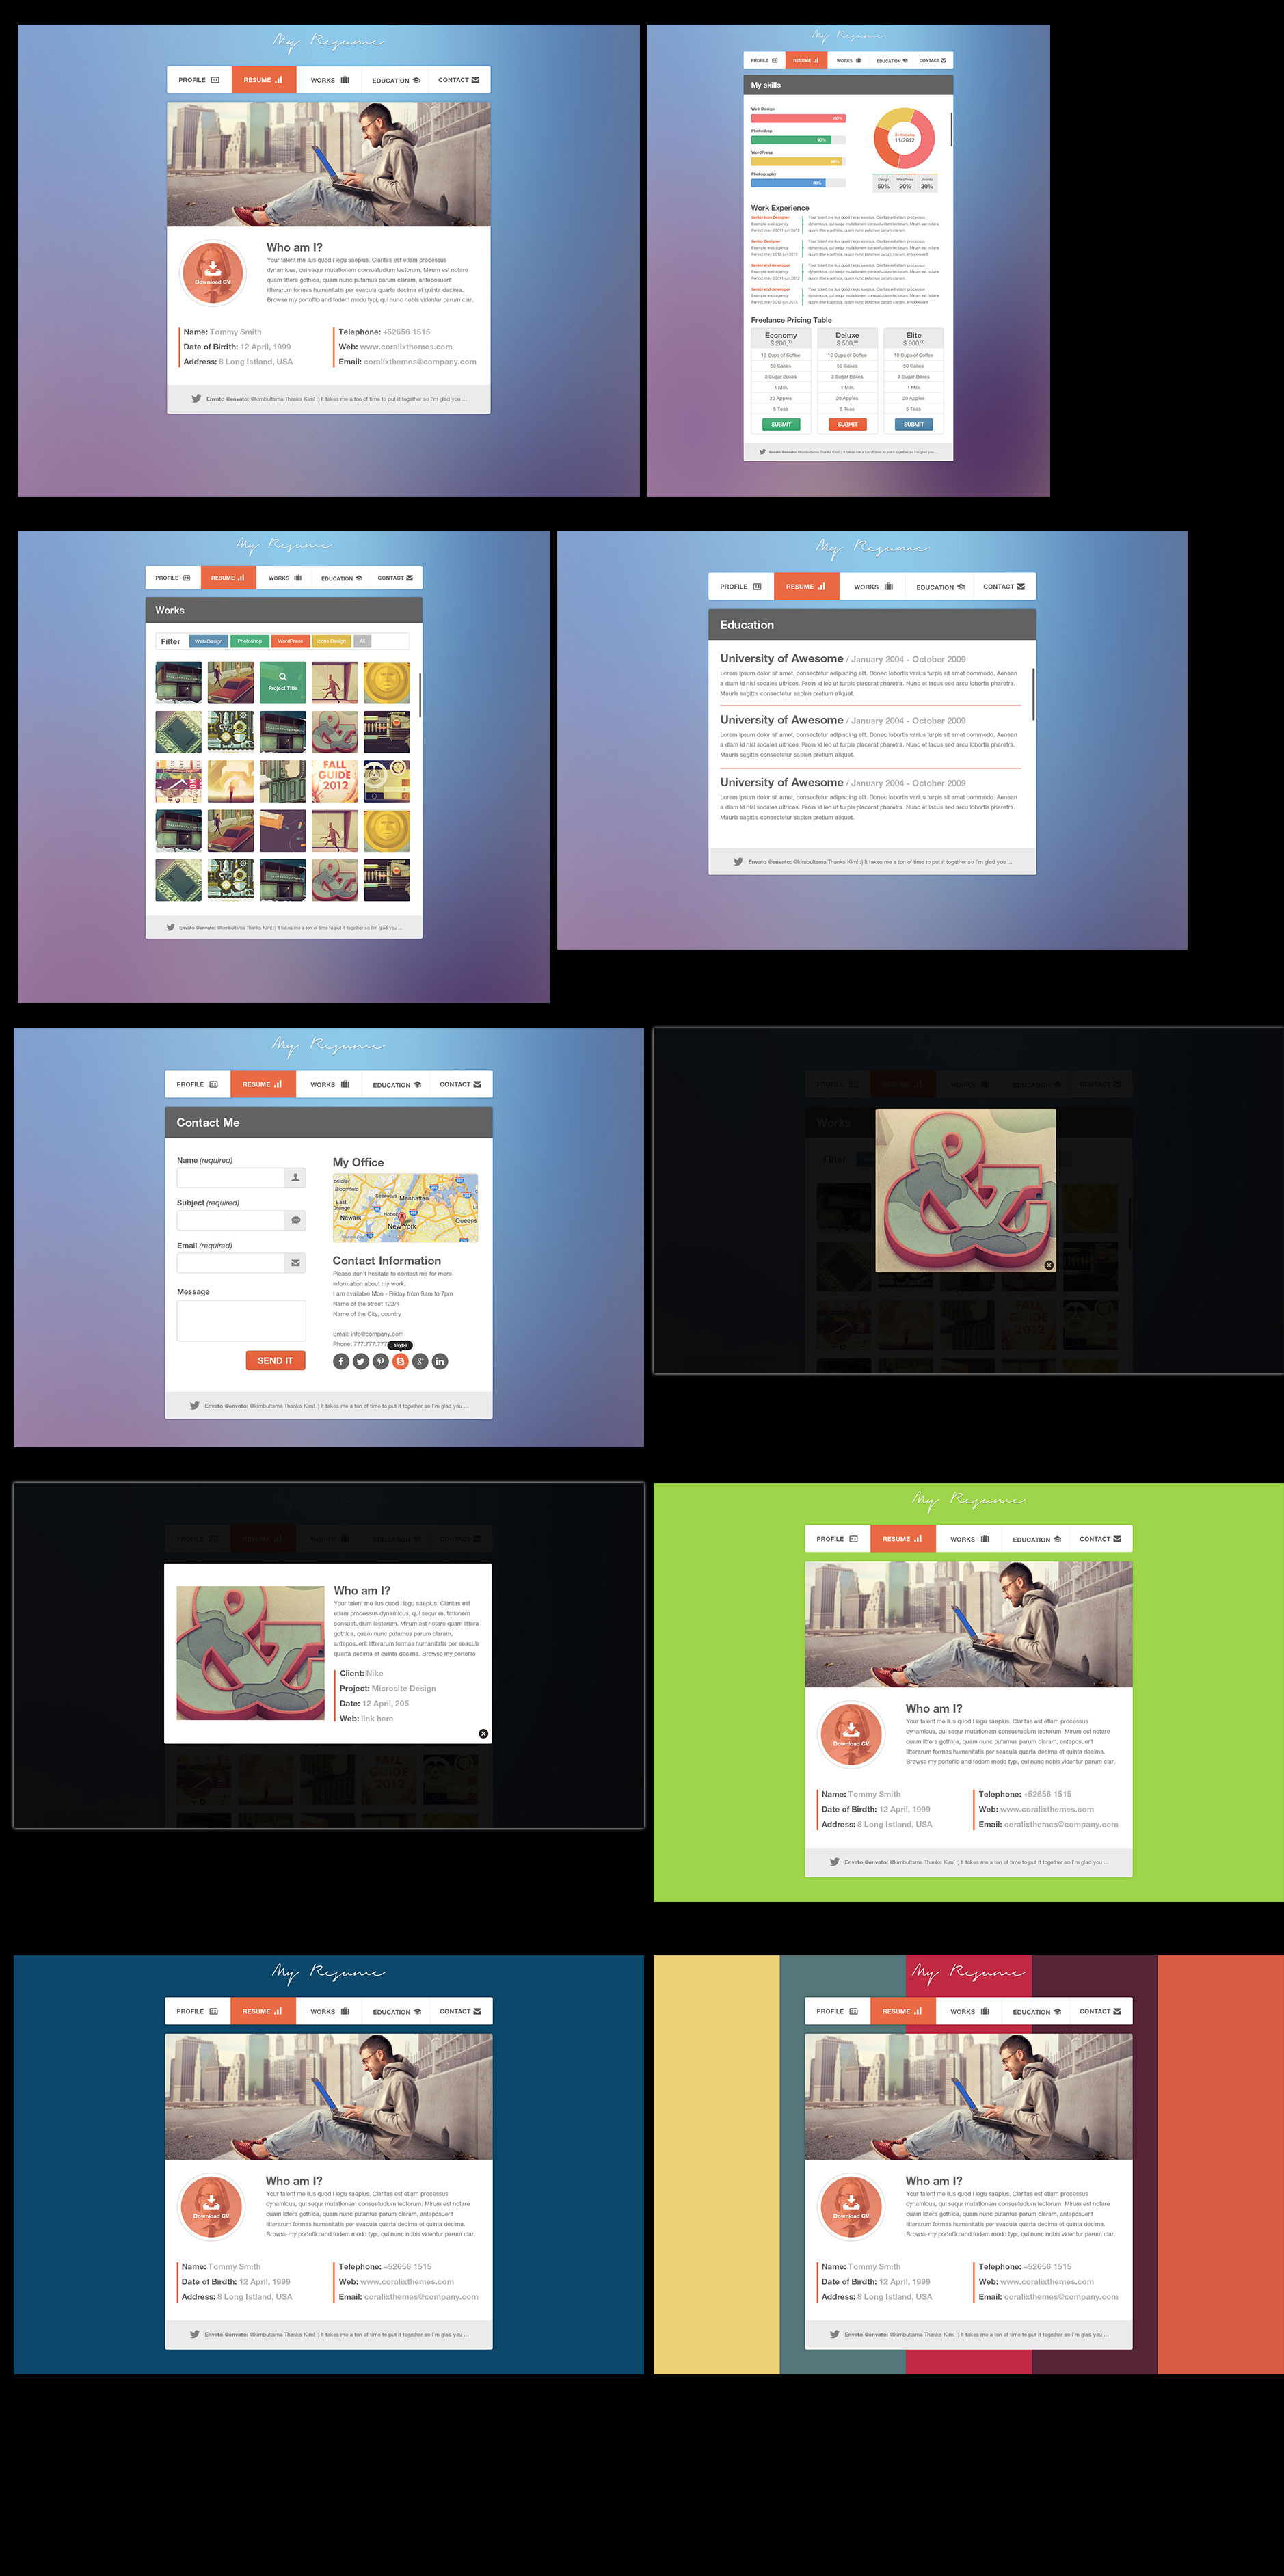 resume minimalist professional vcard psd by coralixthemes